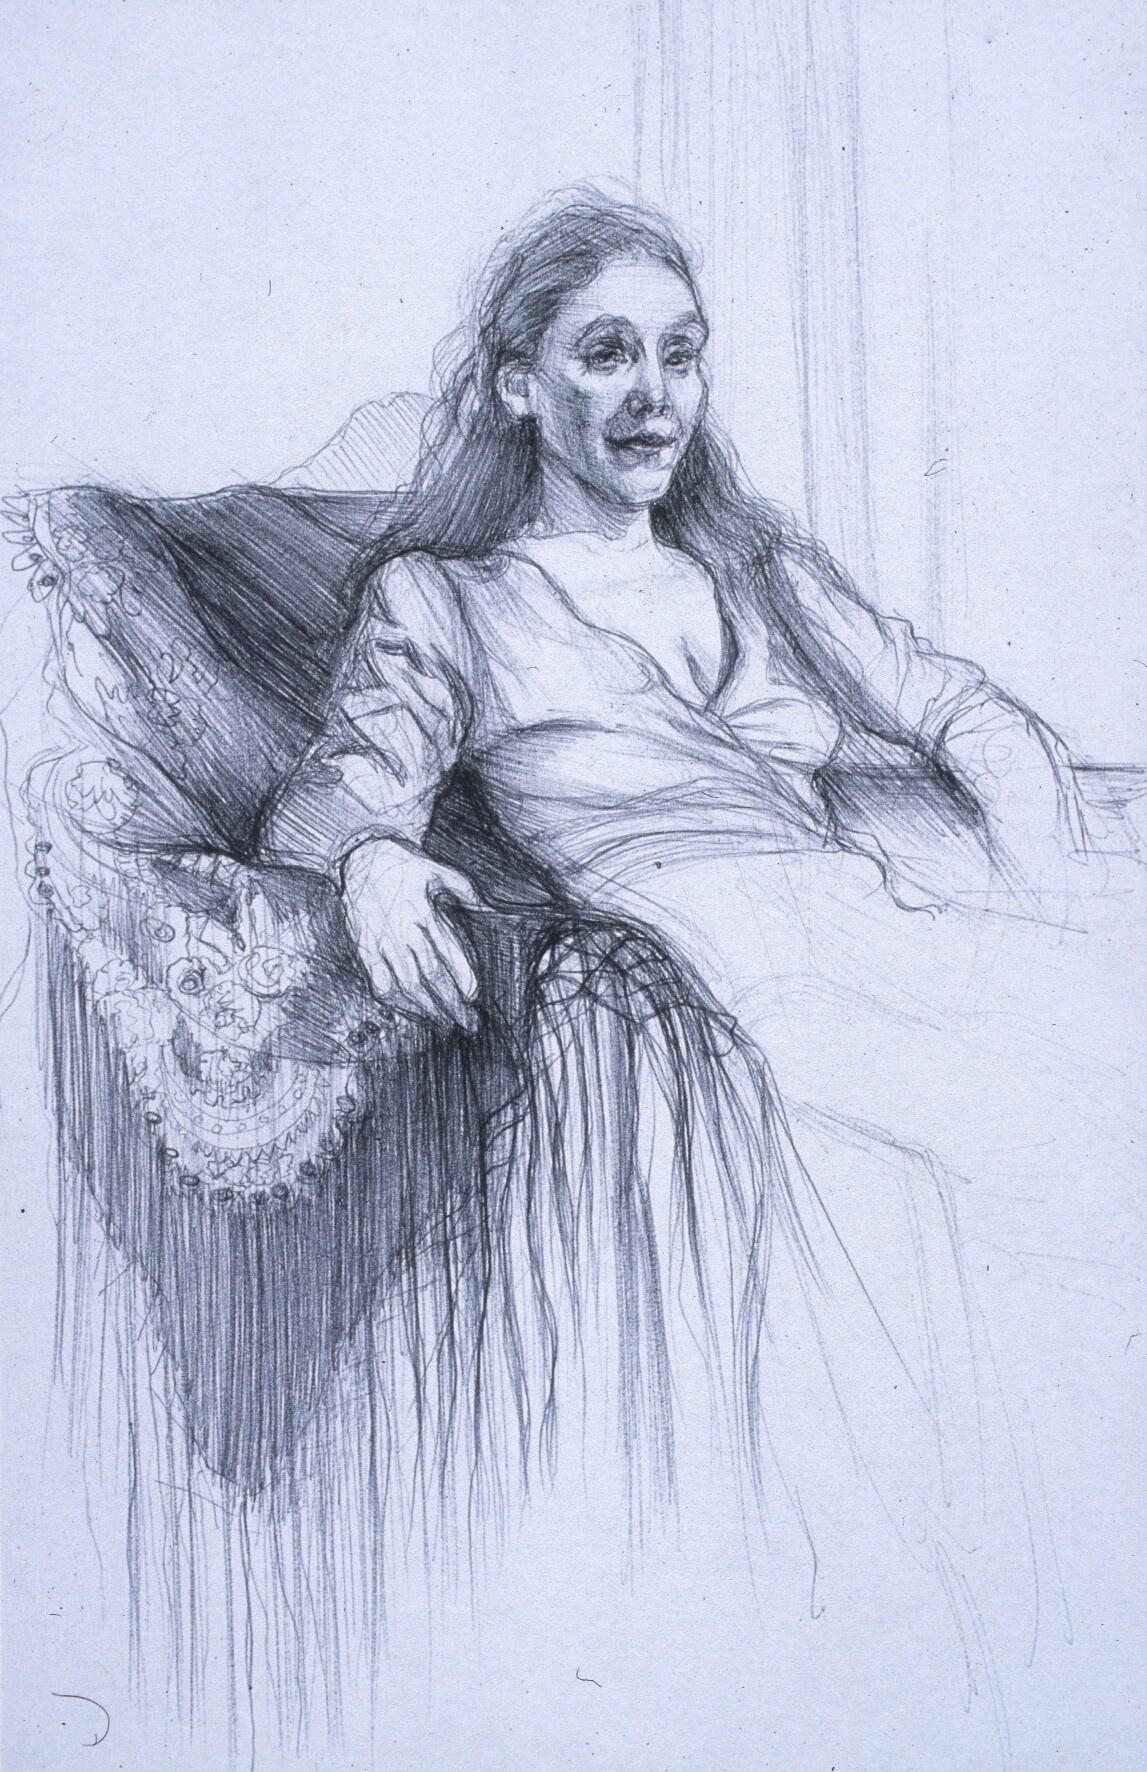 "Lou Ann Burkhardt  Stephanie  , 1999 Pen and ink on paper 13"" x 16"", framed $395"